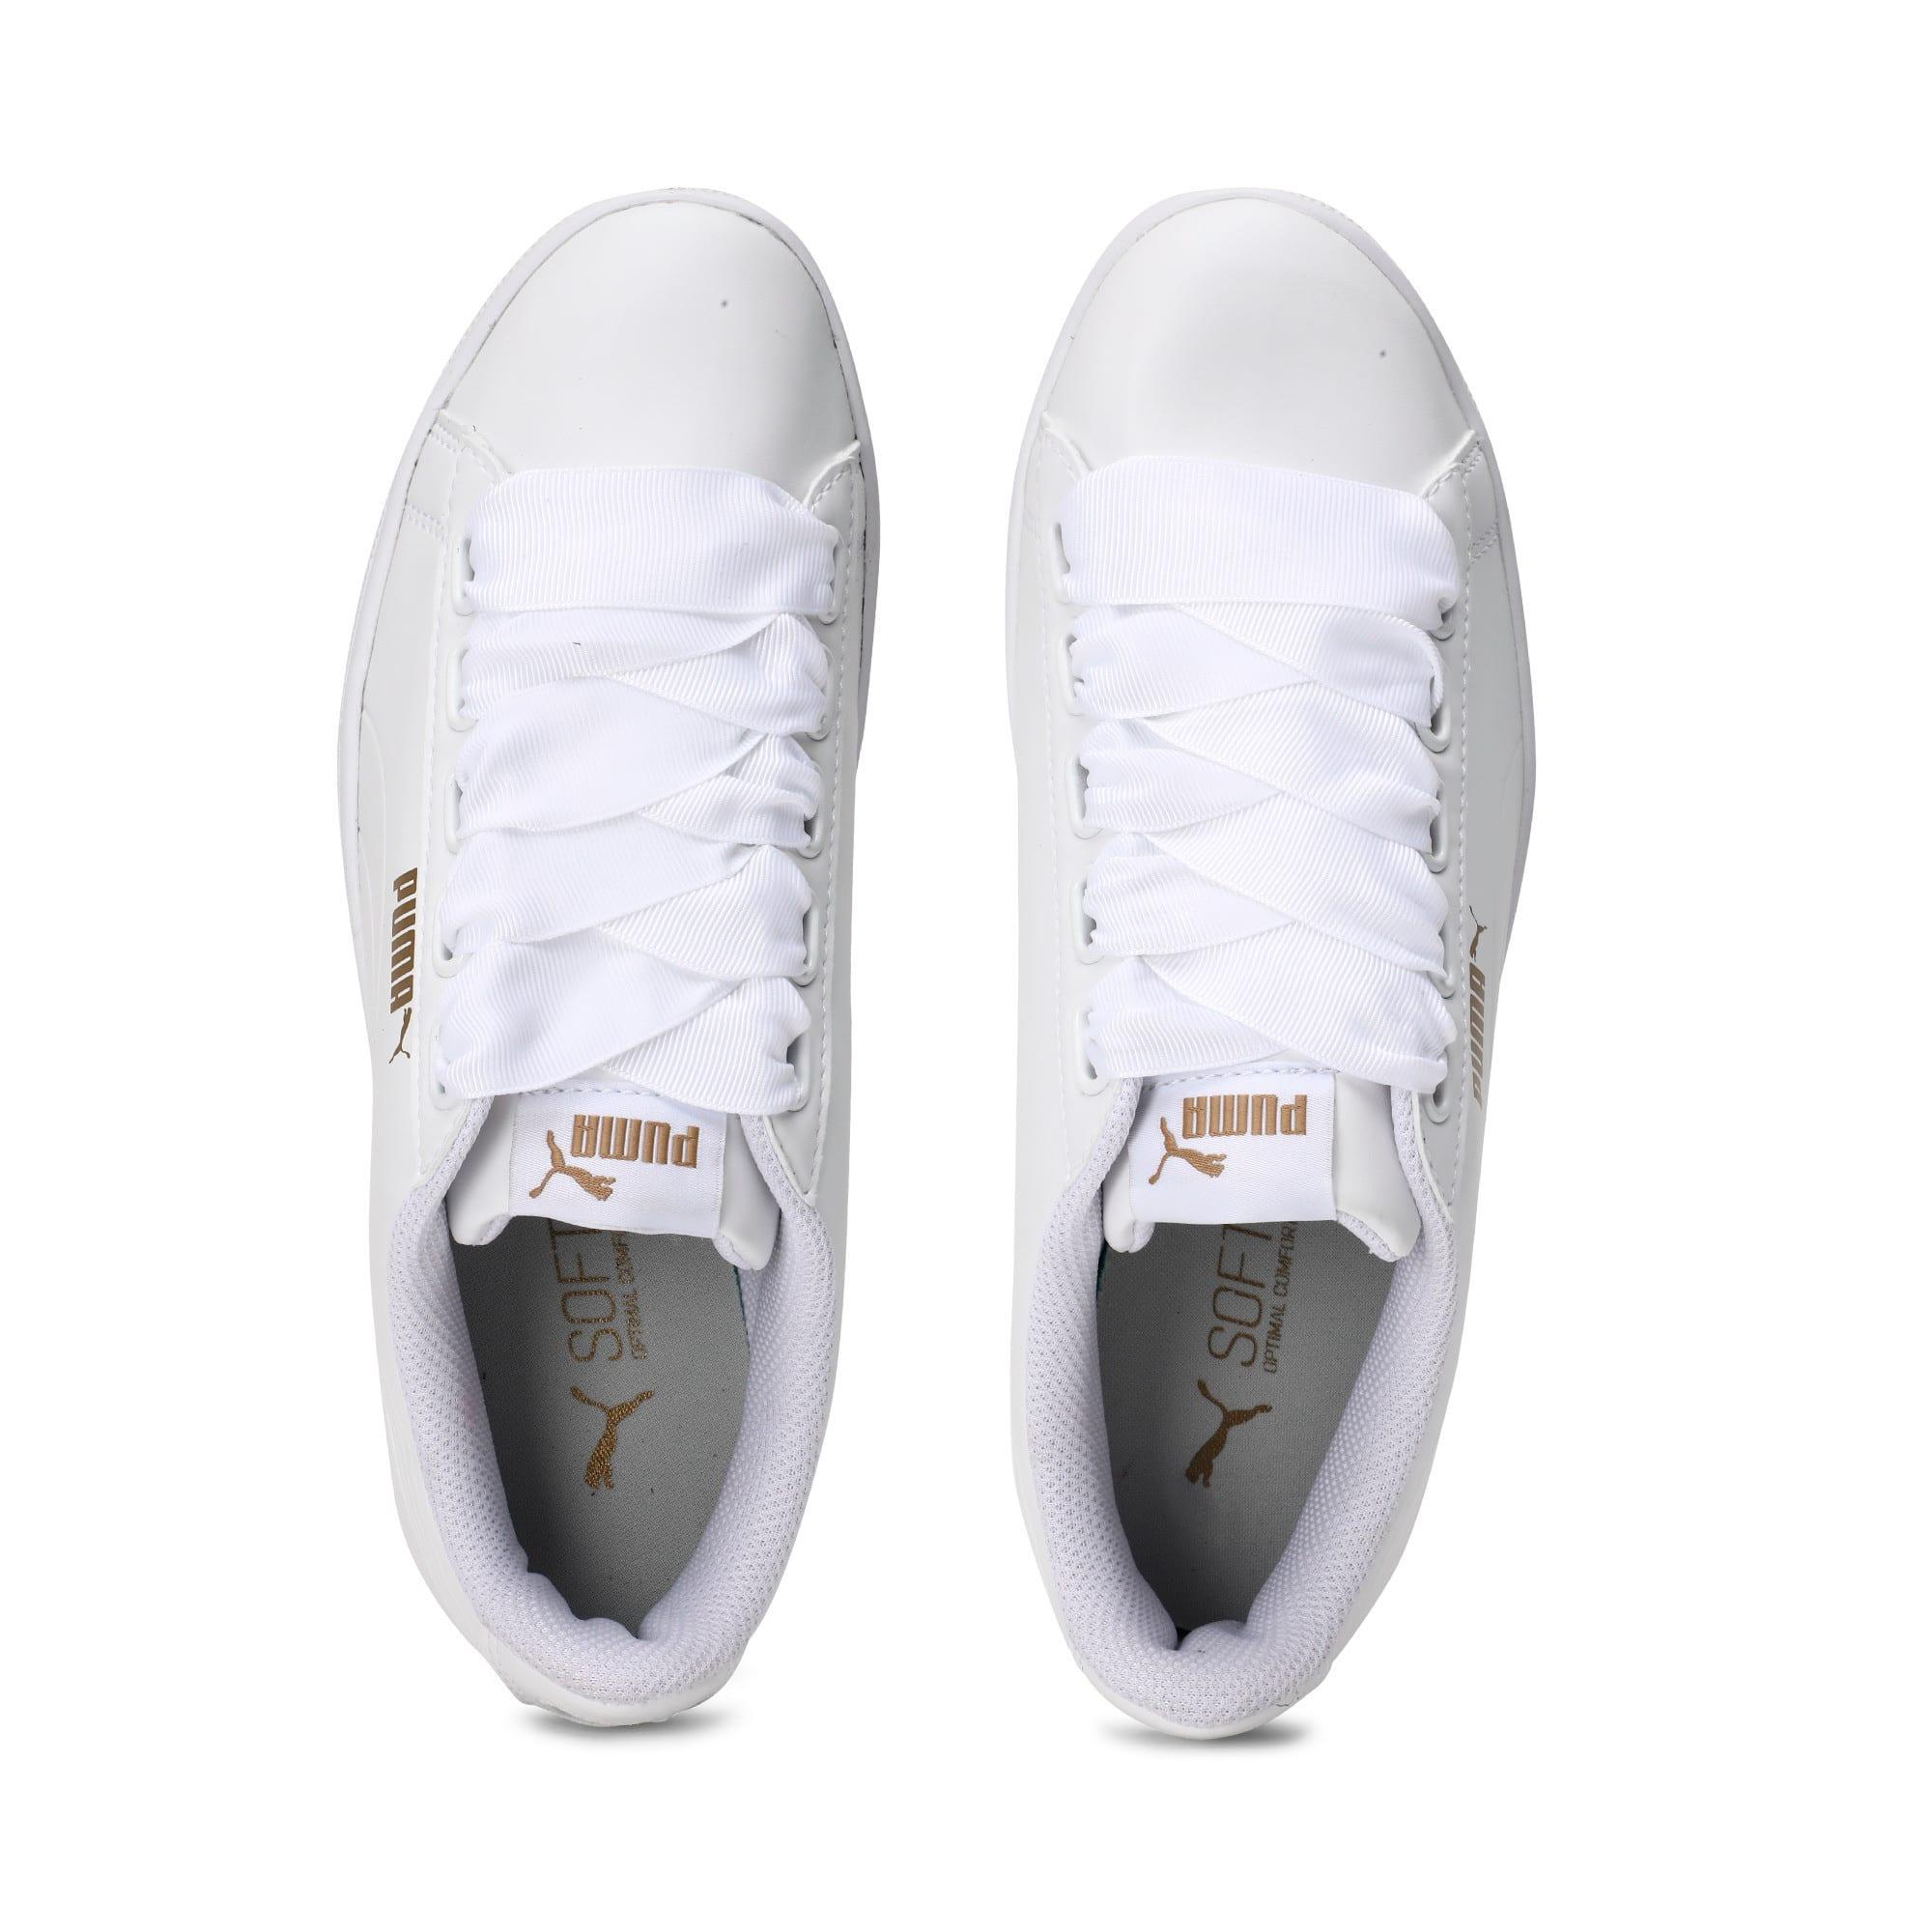 Thumbnail 4 of Women's Puma Vikky Ribbon Sneakers, Puma White-Puma White, medium-IND